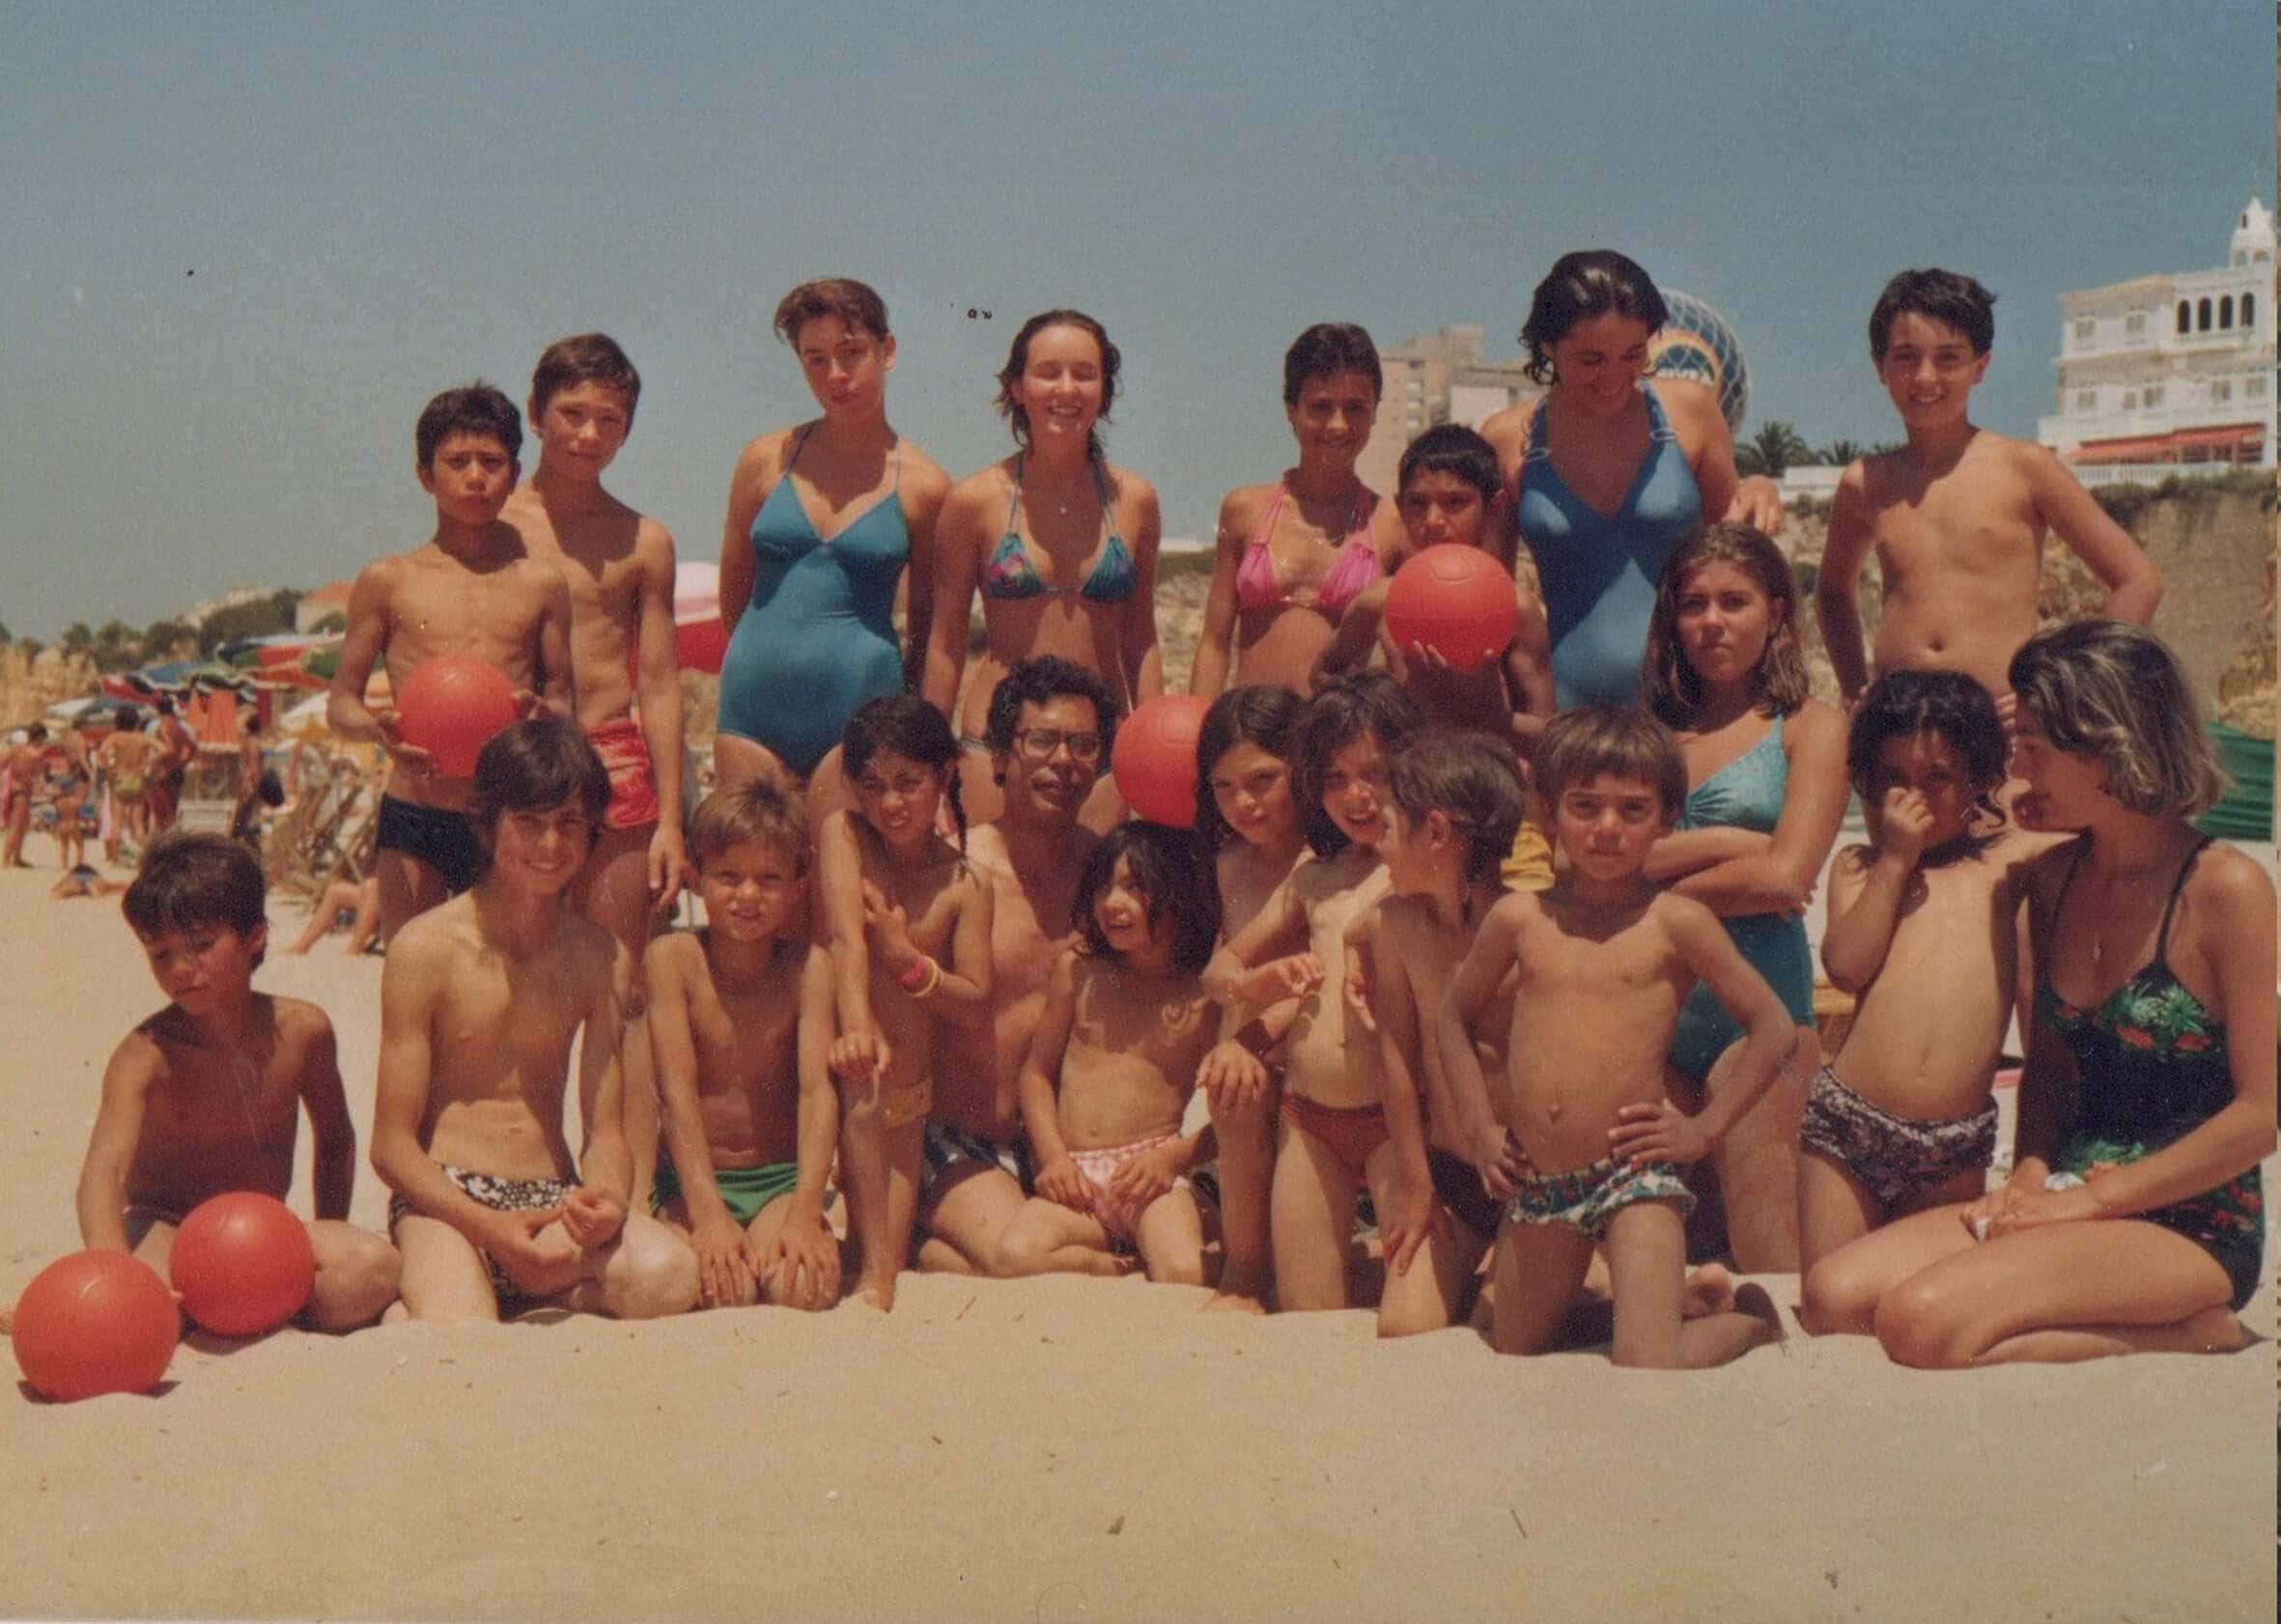 historia-dia-de-praia-com-miudos-ciganos-copia